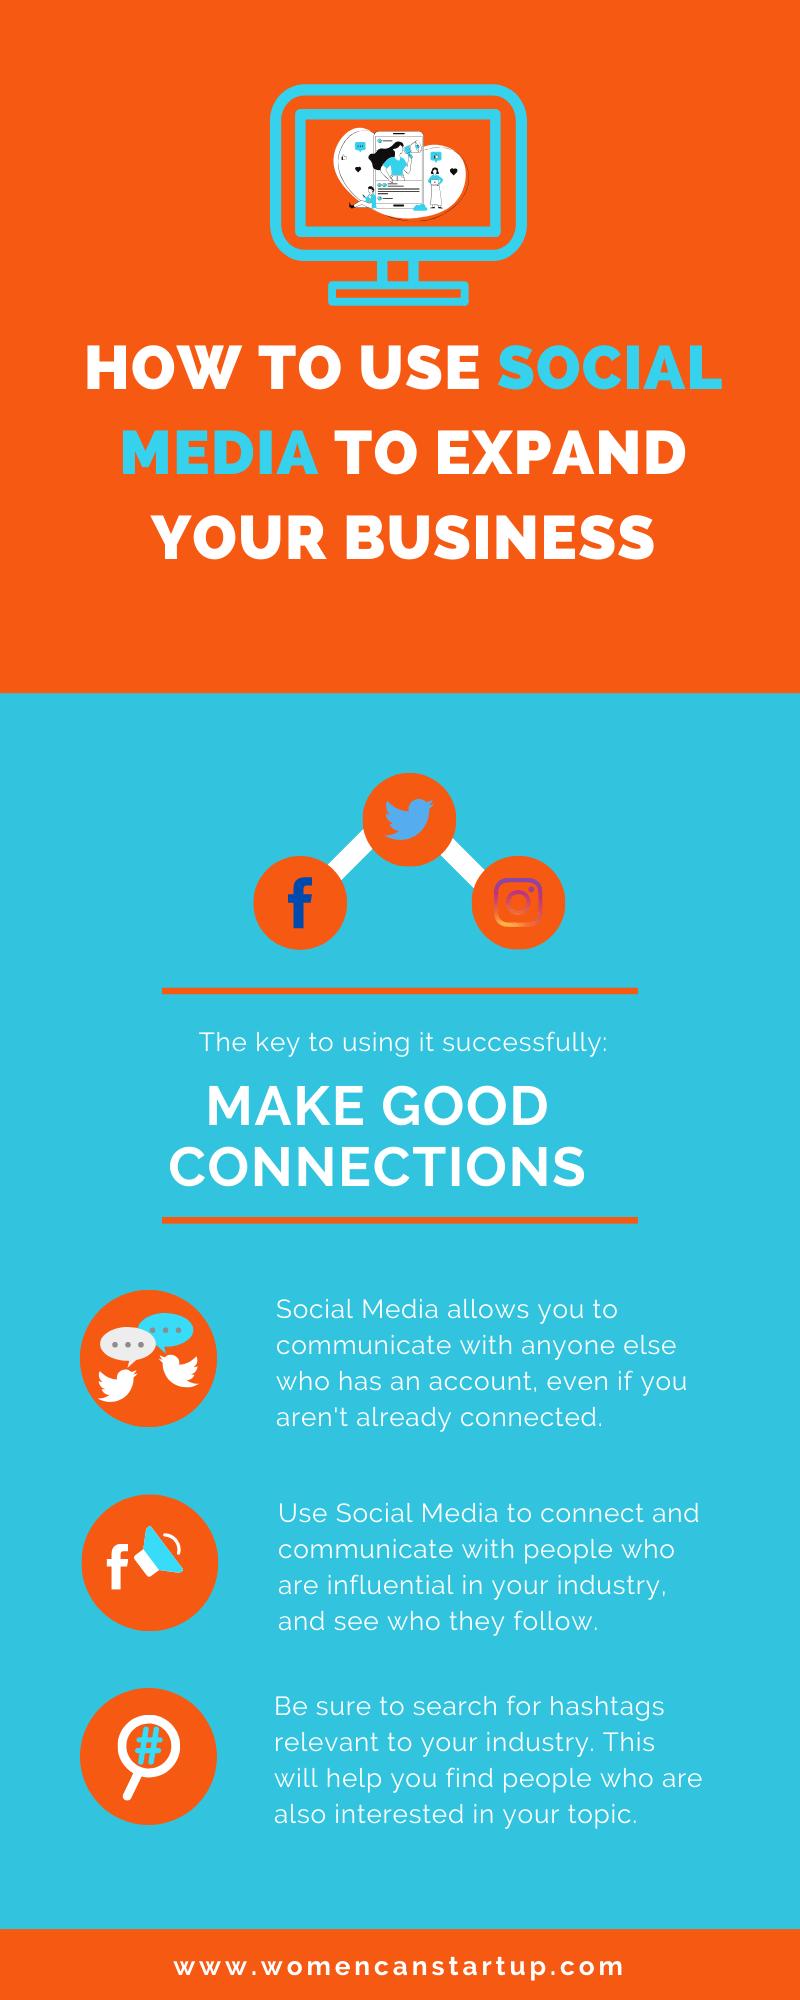 Digital marketing tips - How to use social media